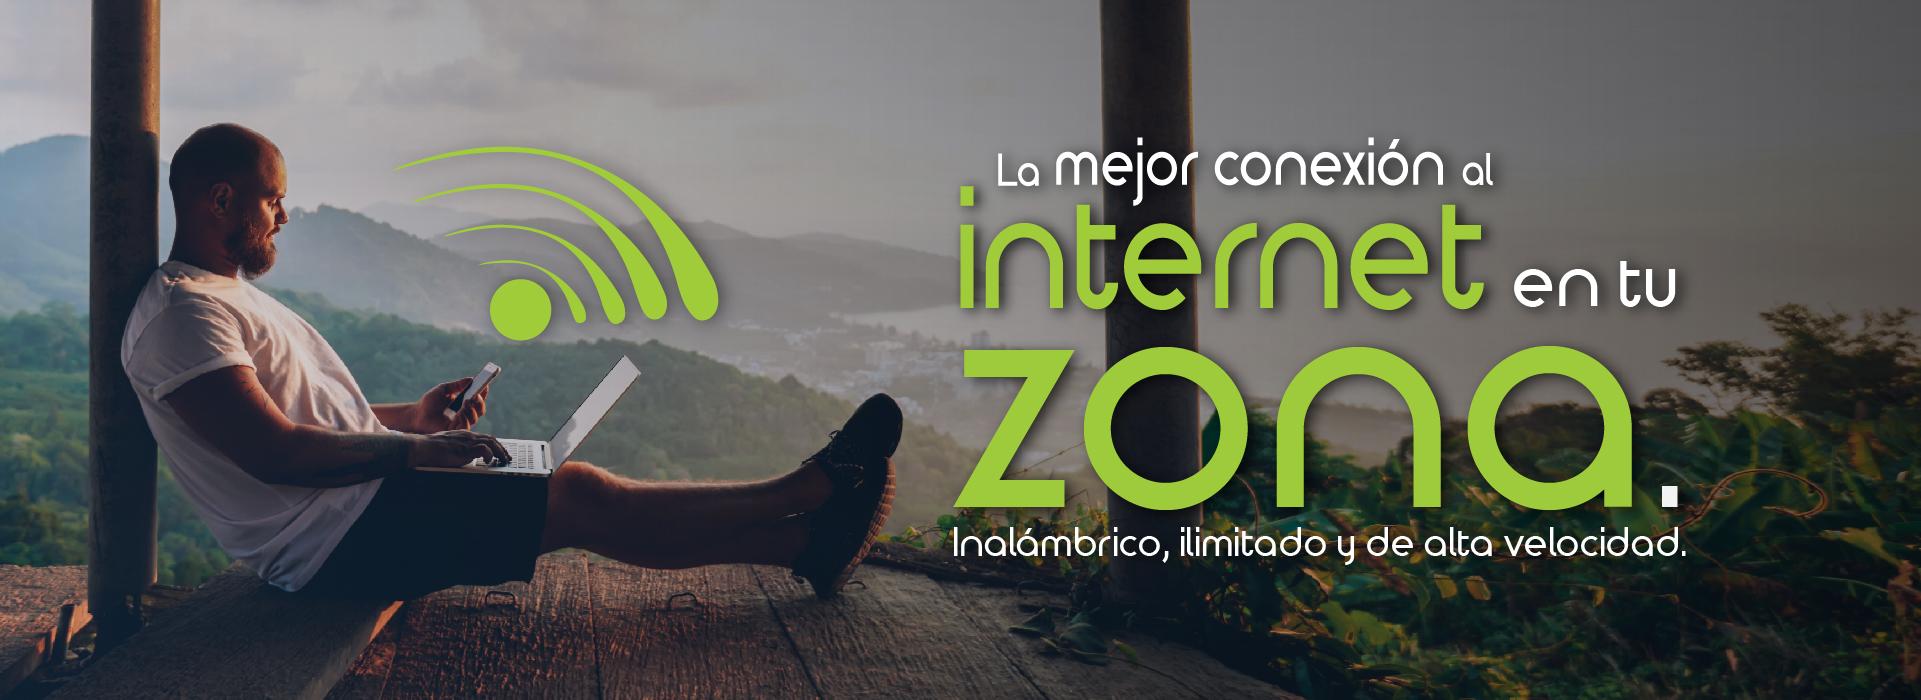 red-verde-internet